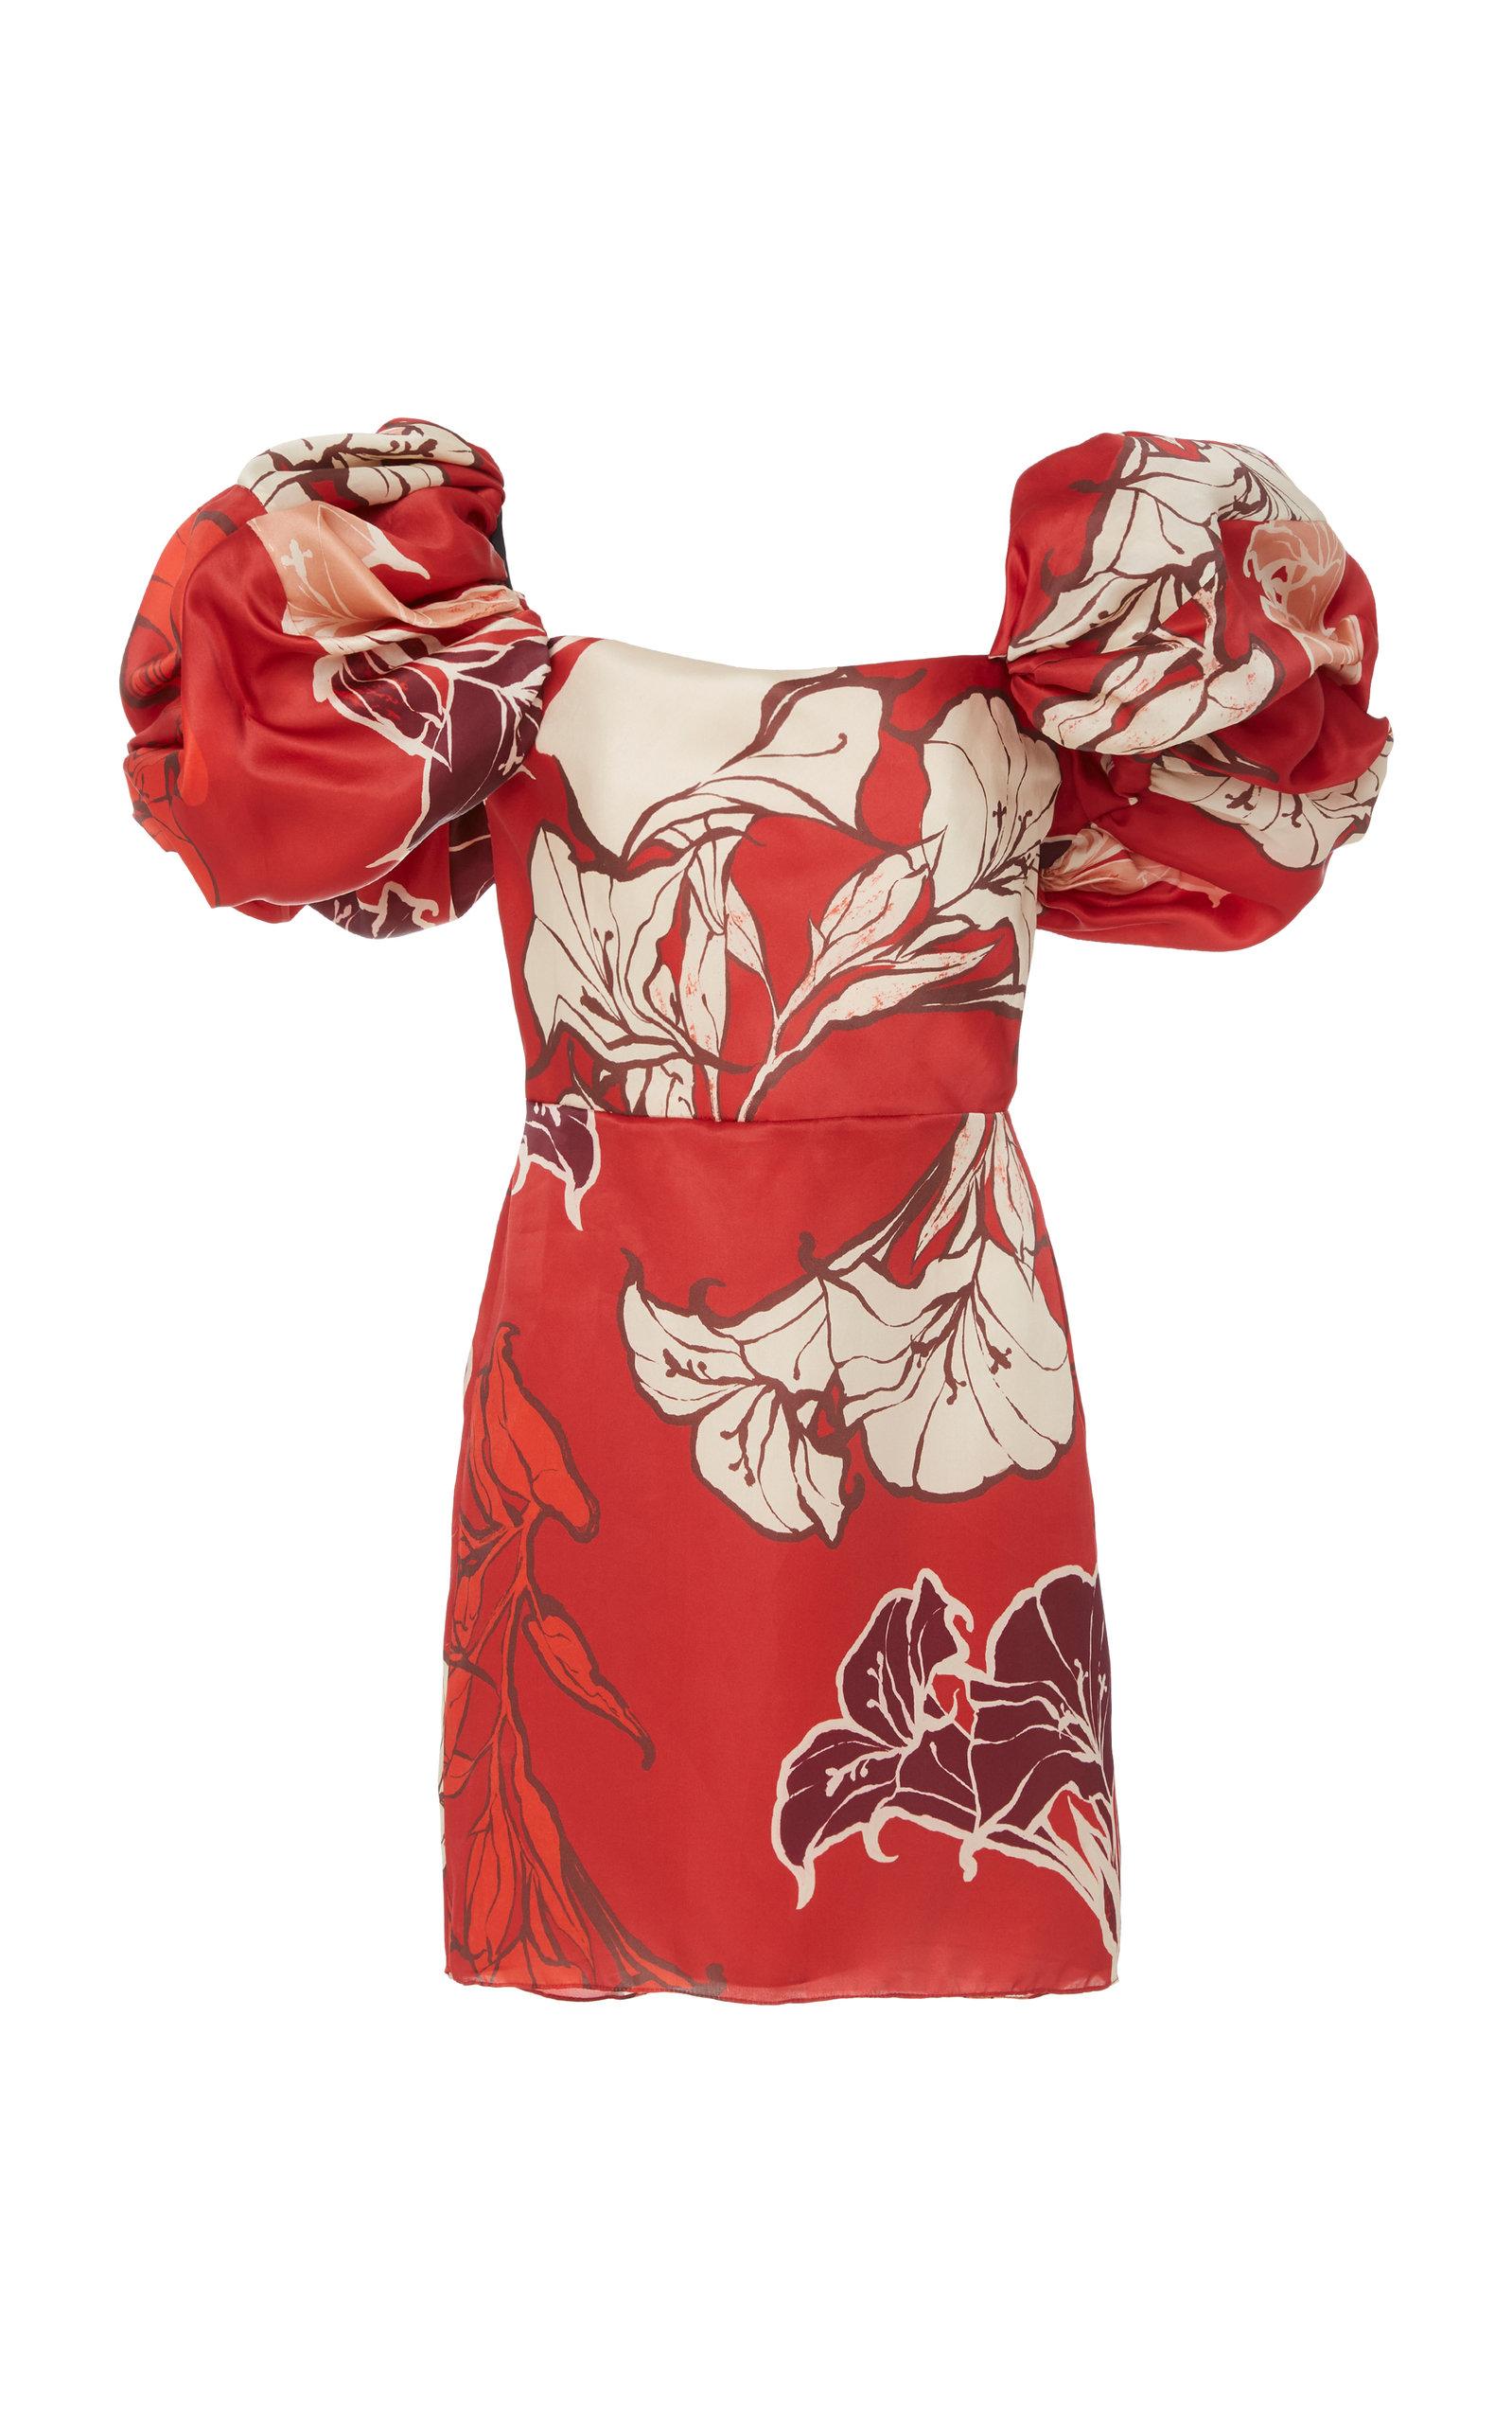 Buy Johanna Ortiz Floral-Print Silk-Satin Mini Dress online, shop Johanna Ortiz at the best price